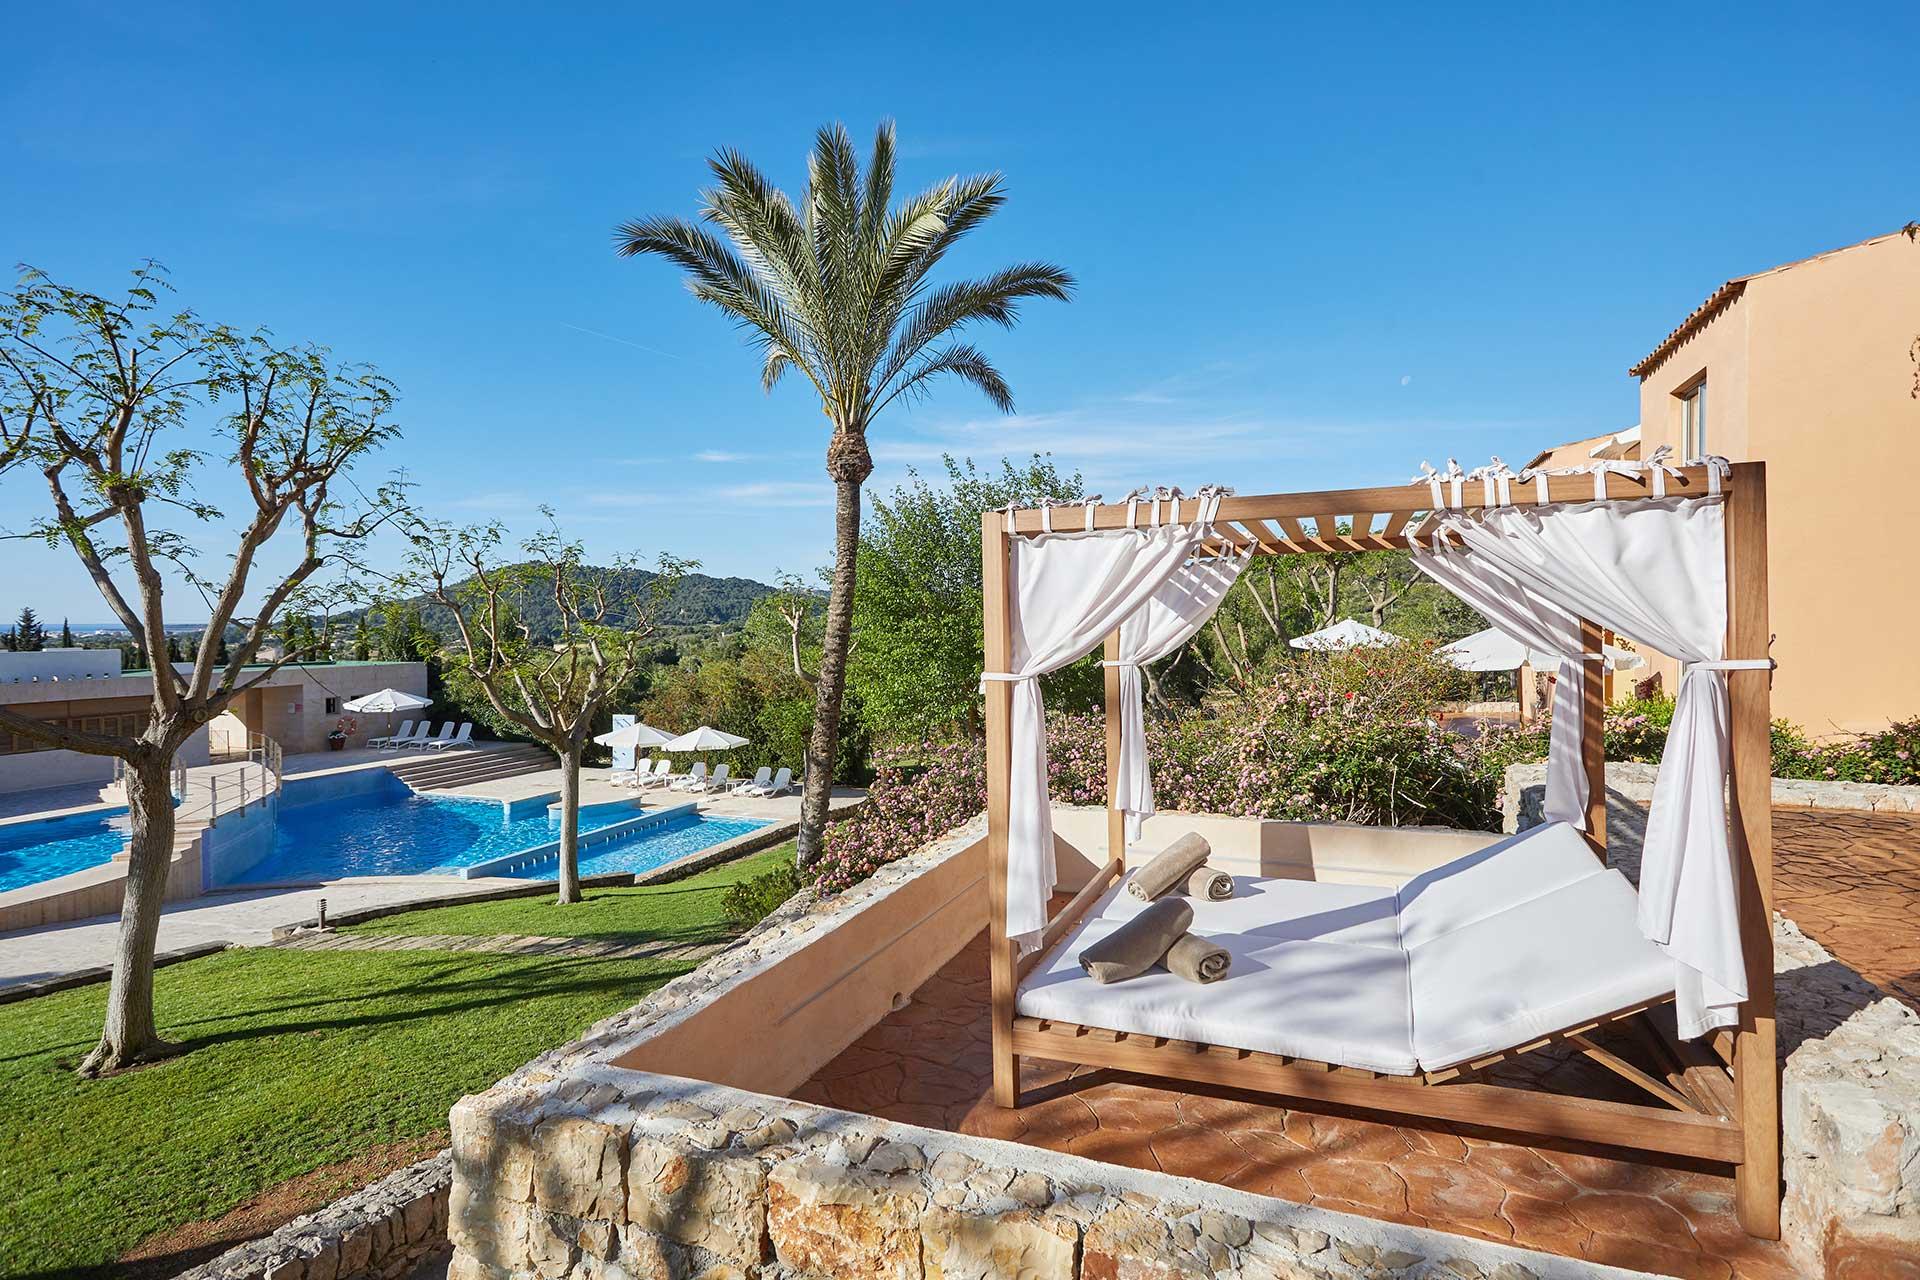 Finca-Hotel Sentido Pula Suites - Balibed Suite